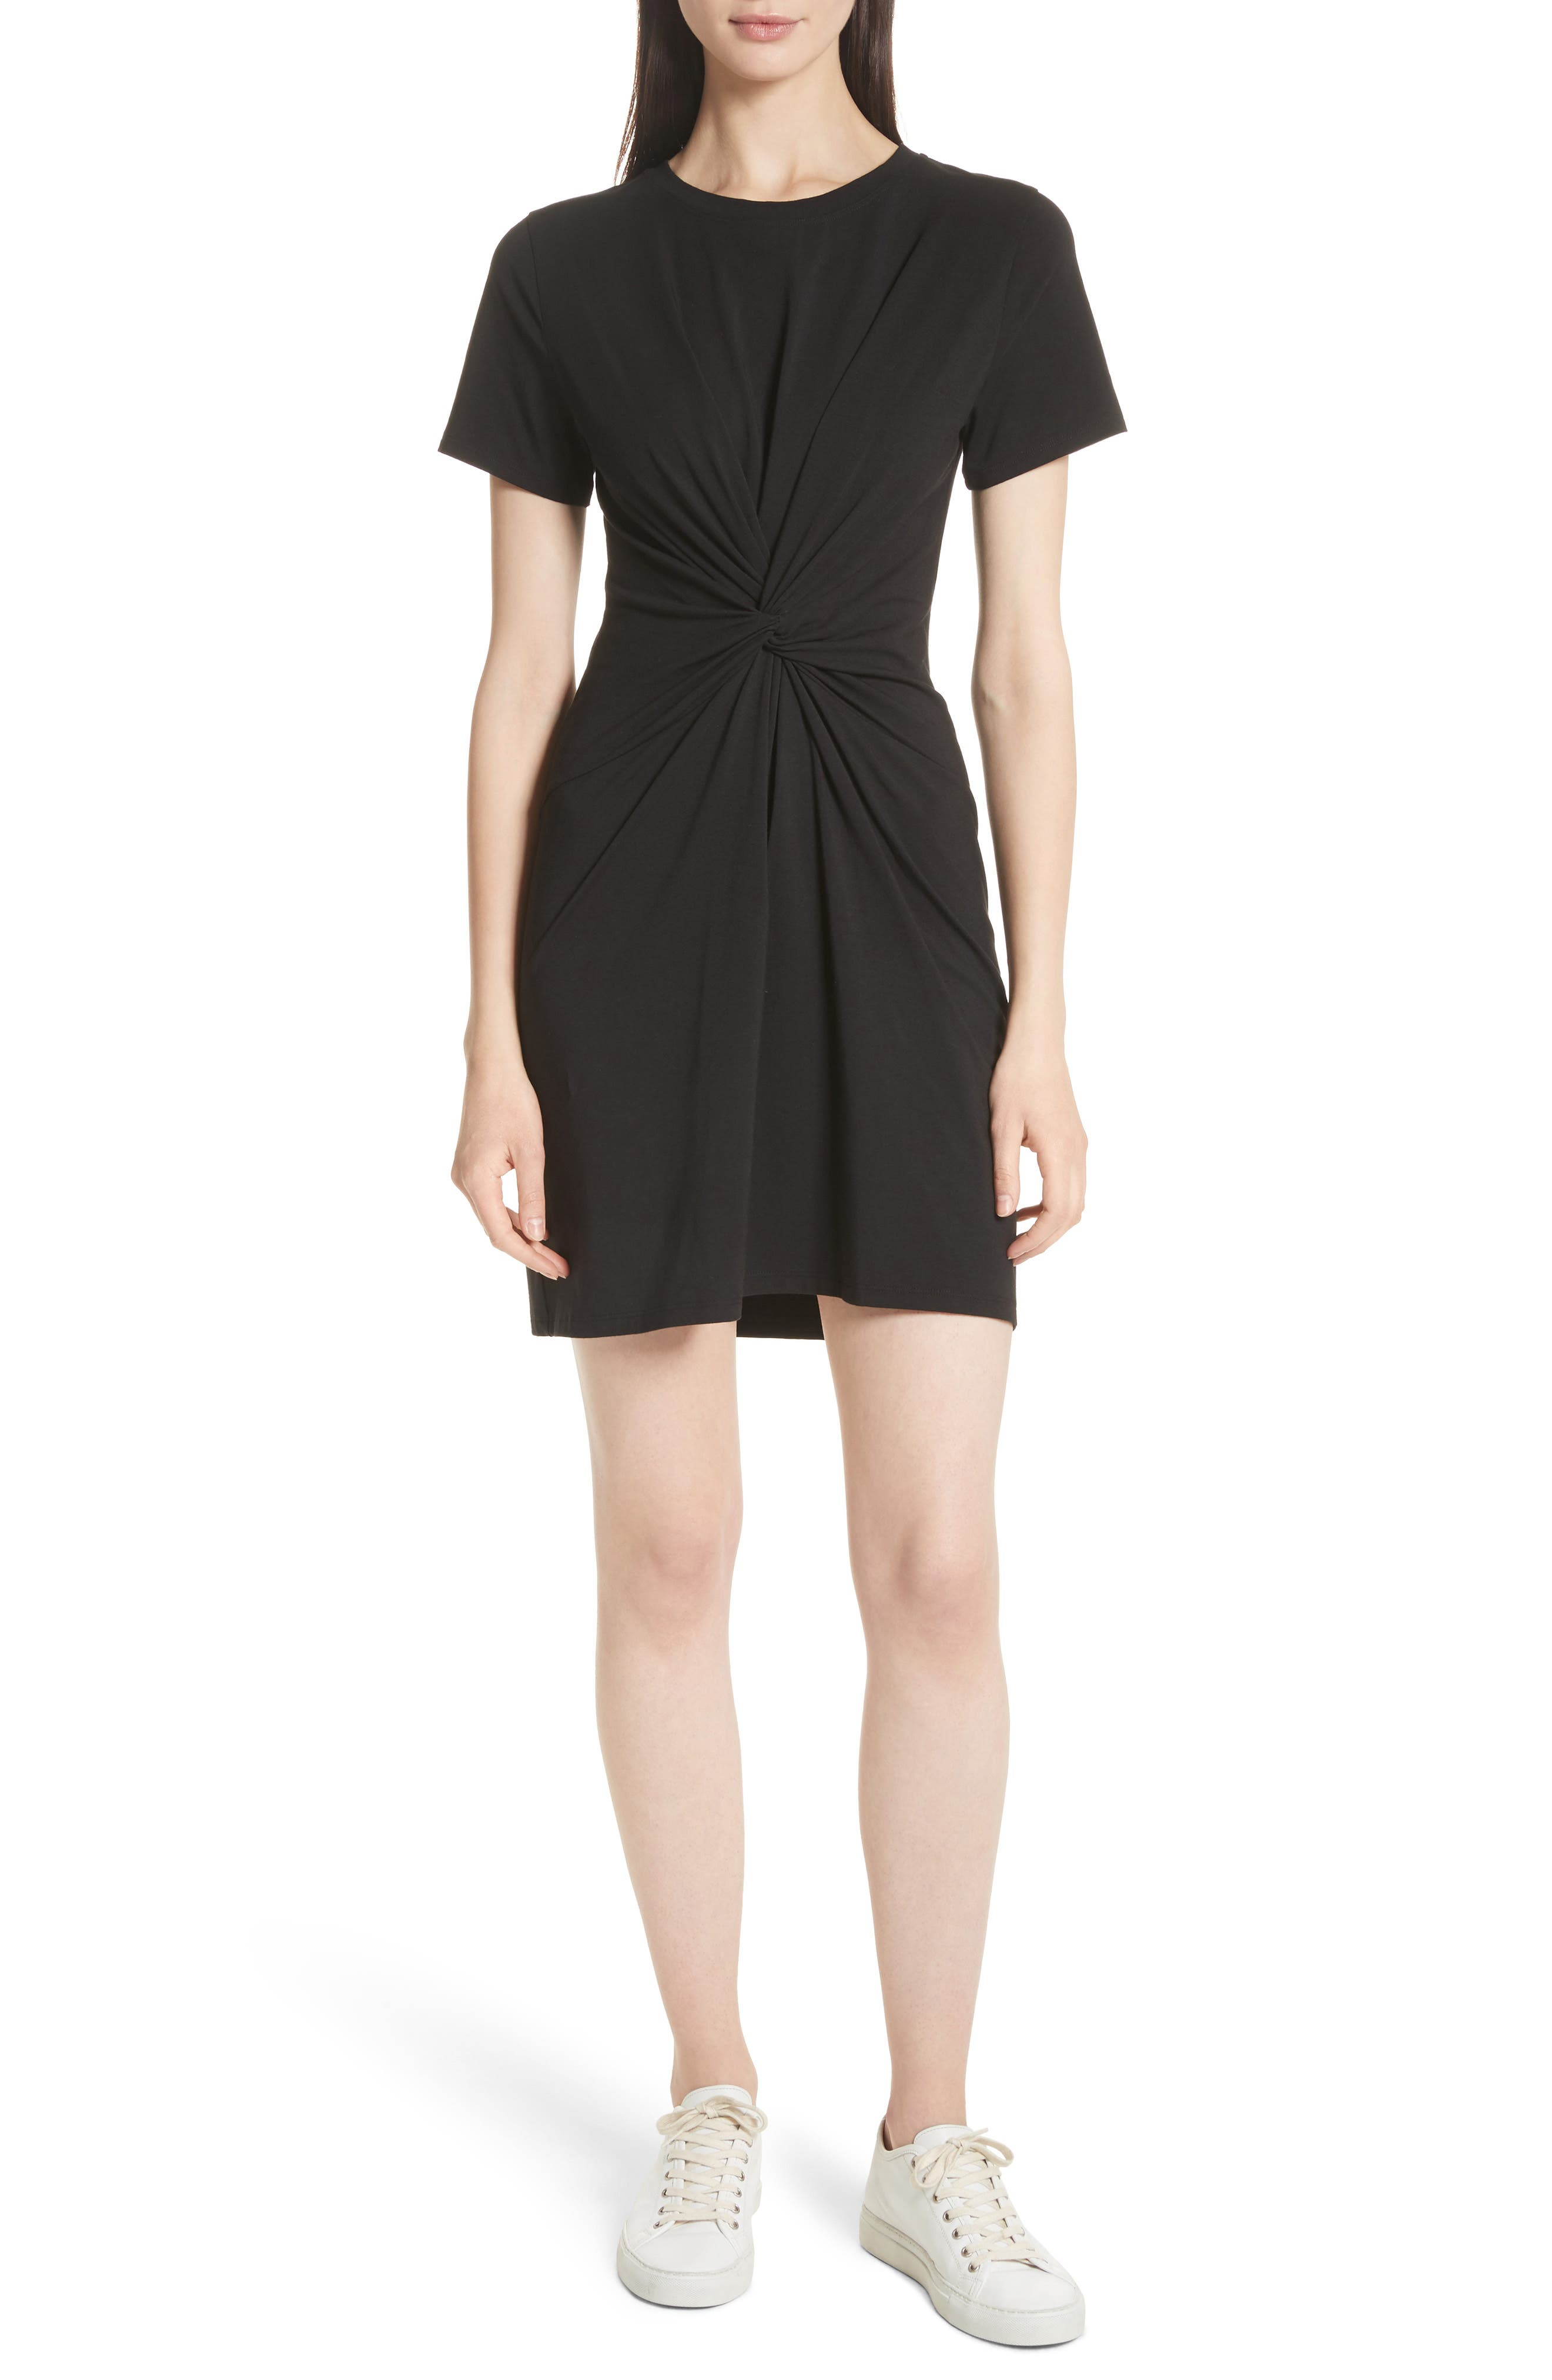 Rubri Knotted T-Shirt Dress,                         Main,                         color, BLACK MULTI